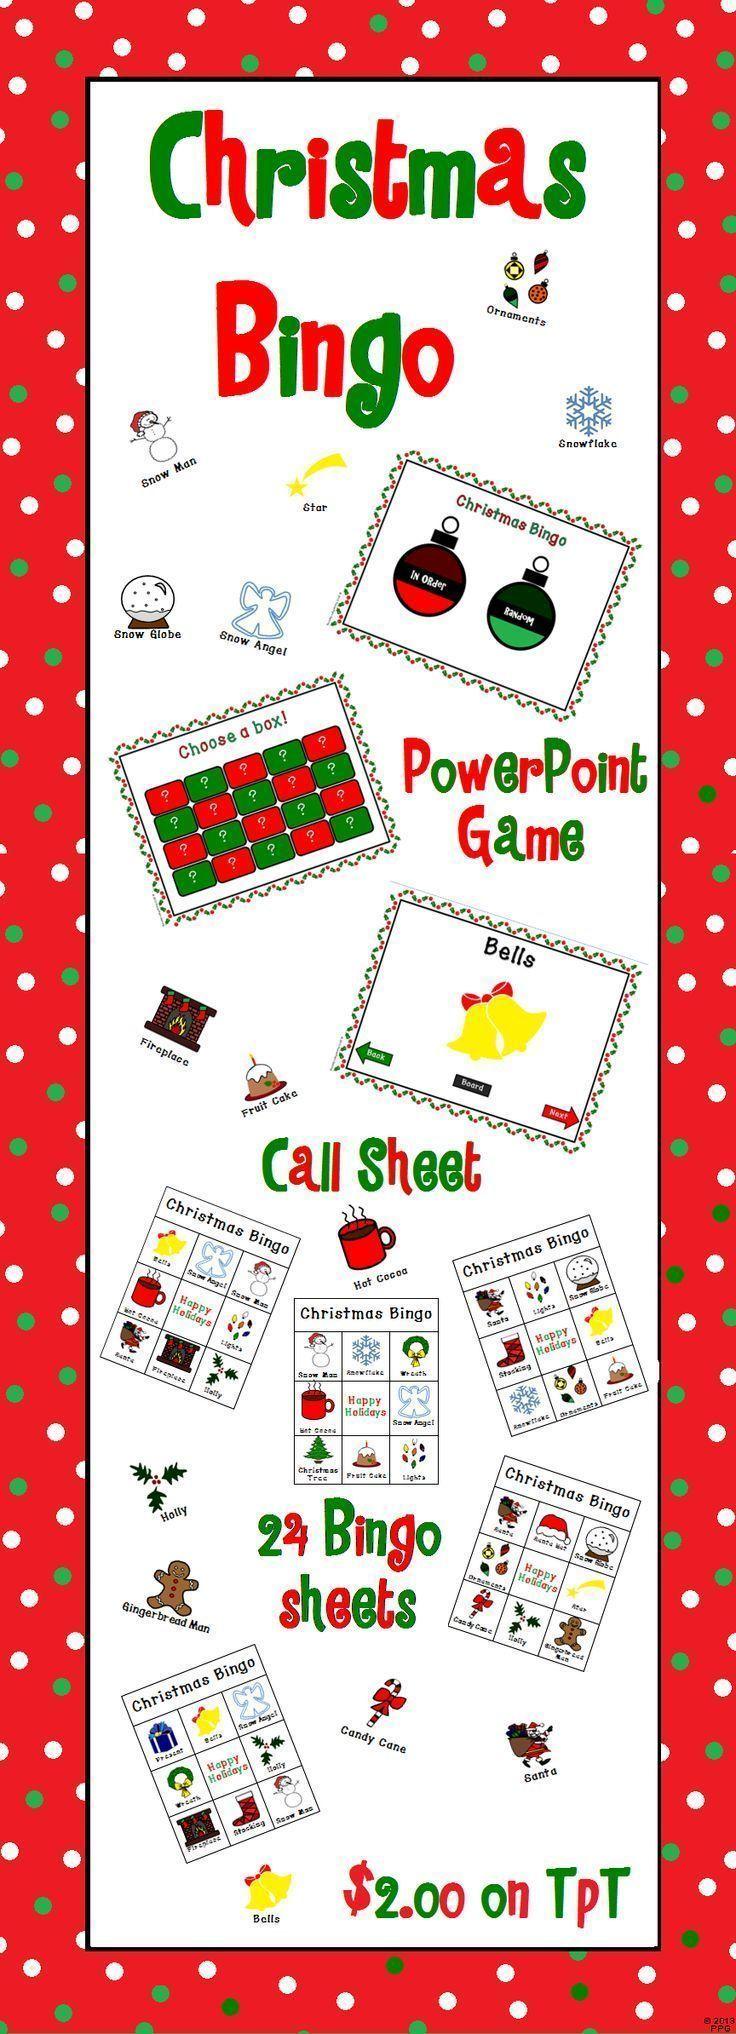 Christmas Bingo Powerpoint Game Kit | Christmas bingo, Christmas ...